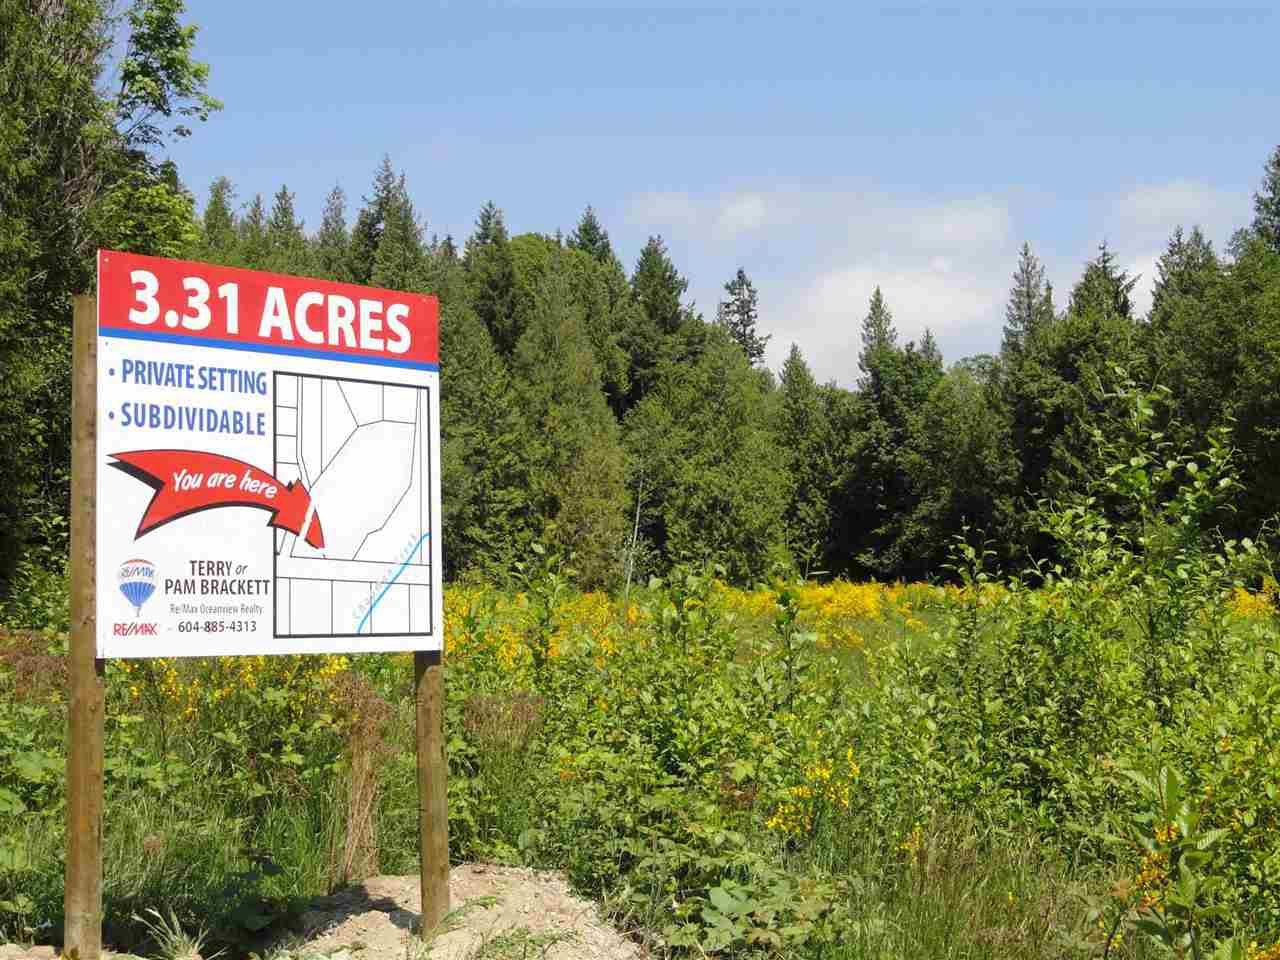 Photo 4: Photos: LOT 16 GUNCLUB ROAD in Sechelt: Sechelt District Land for sale (Sunshine Coast)  : MLS®# R2075941